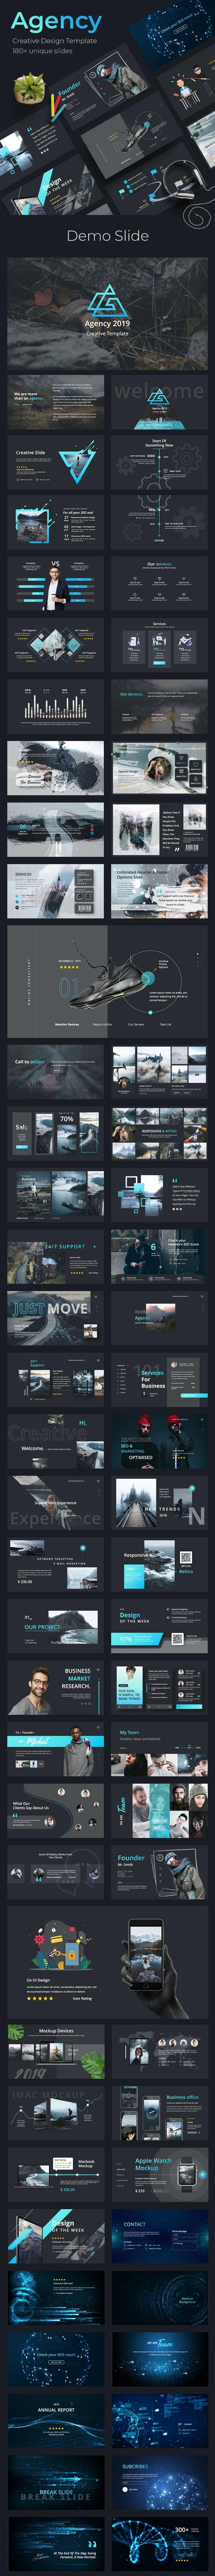 Agency Creative Keynote Template - Creative Keynote Templates